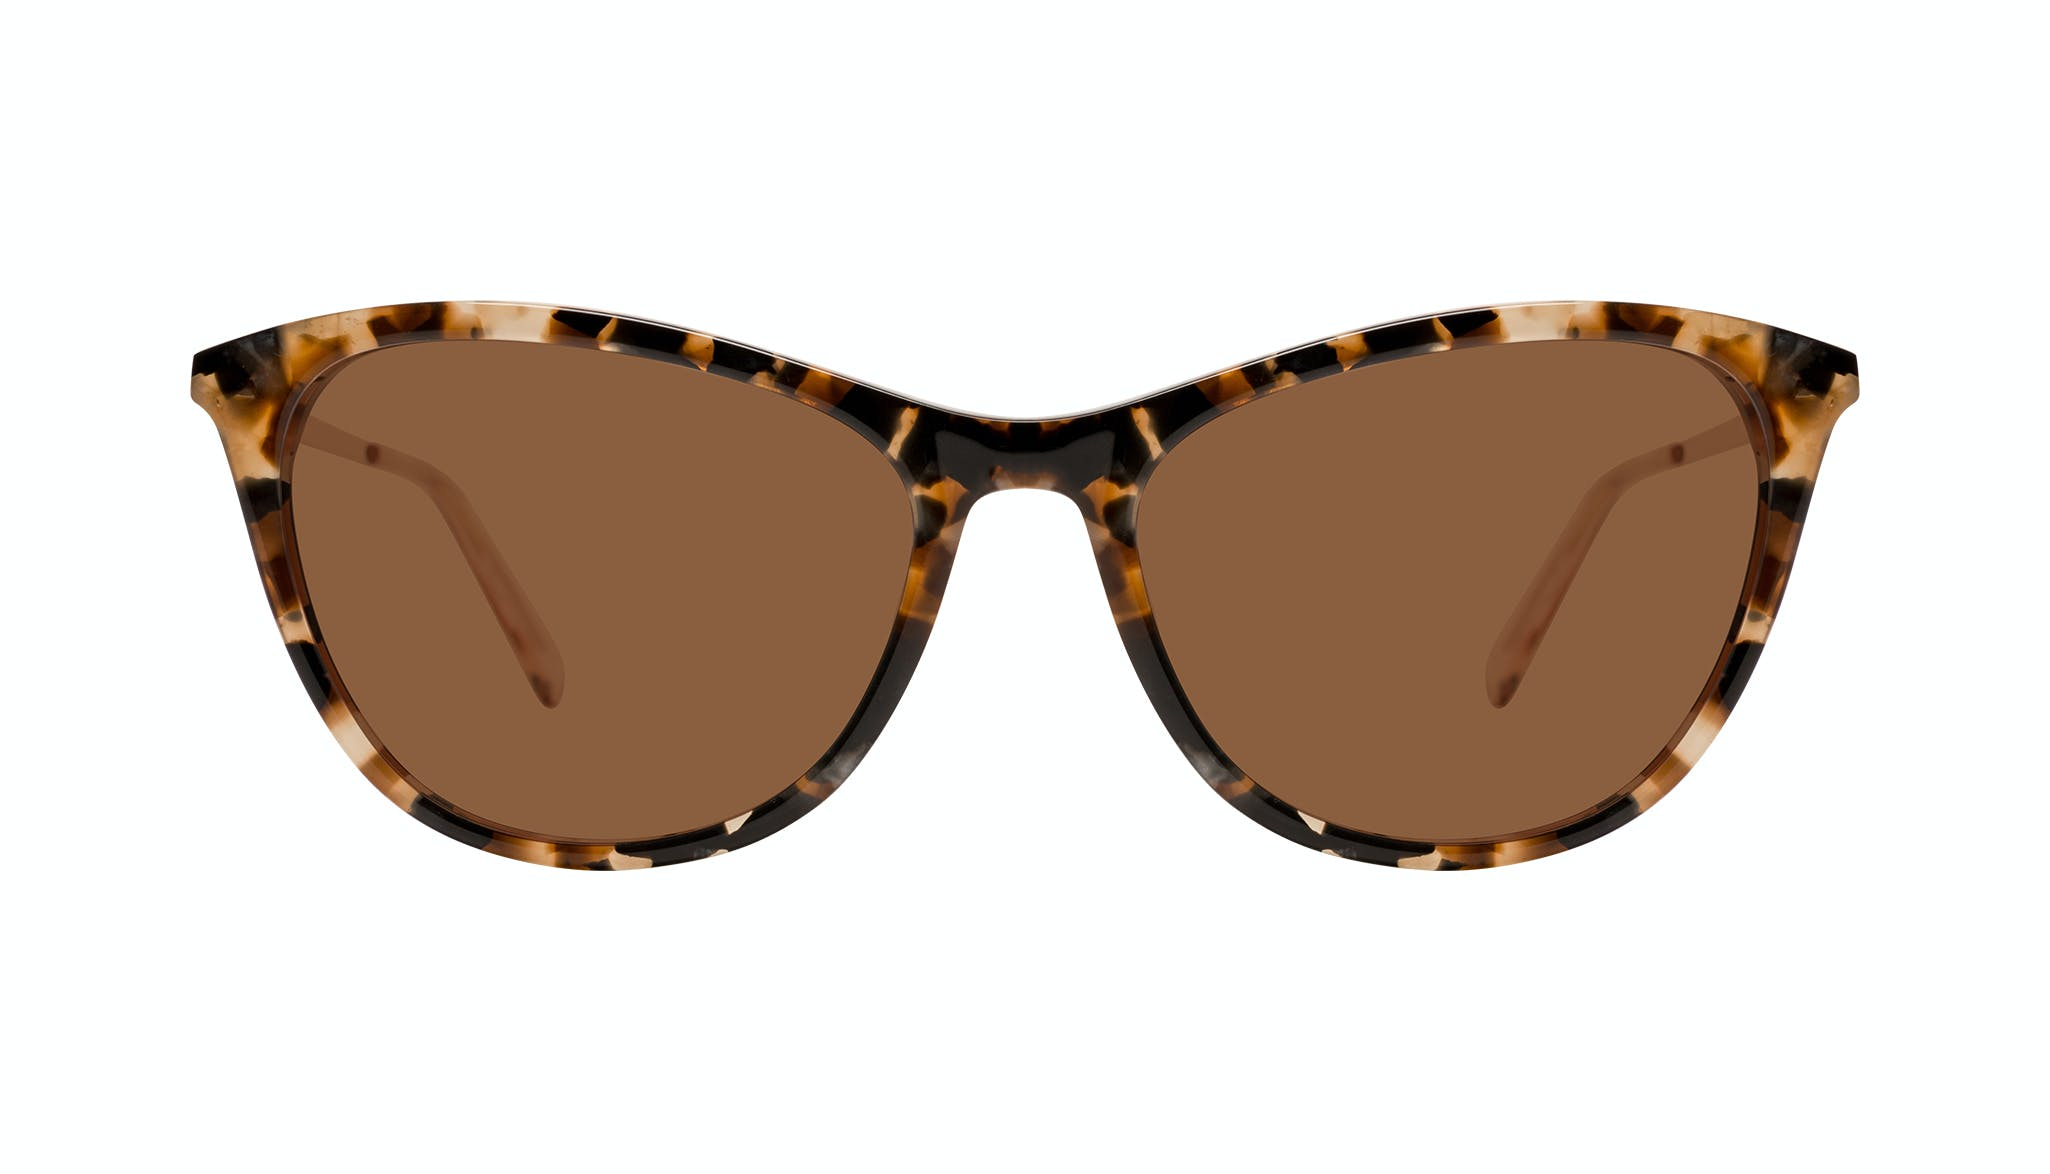 Affordable Fashion Glasses Cat Eye Sunglasses Women Folk Plus Gold Flake